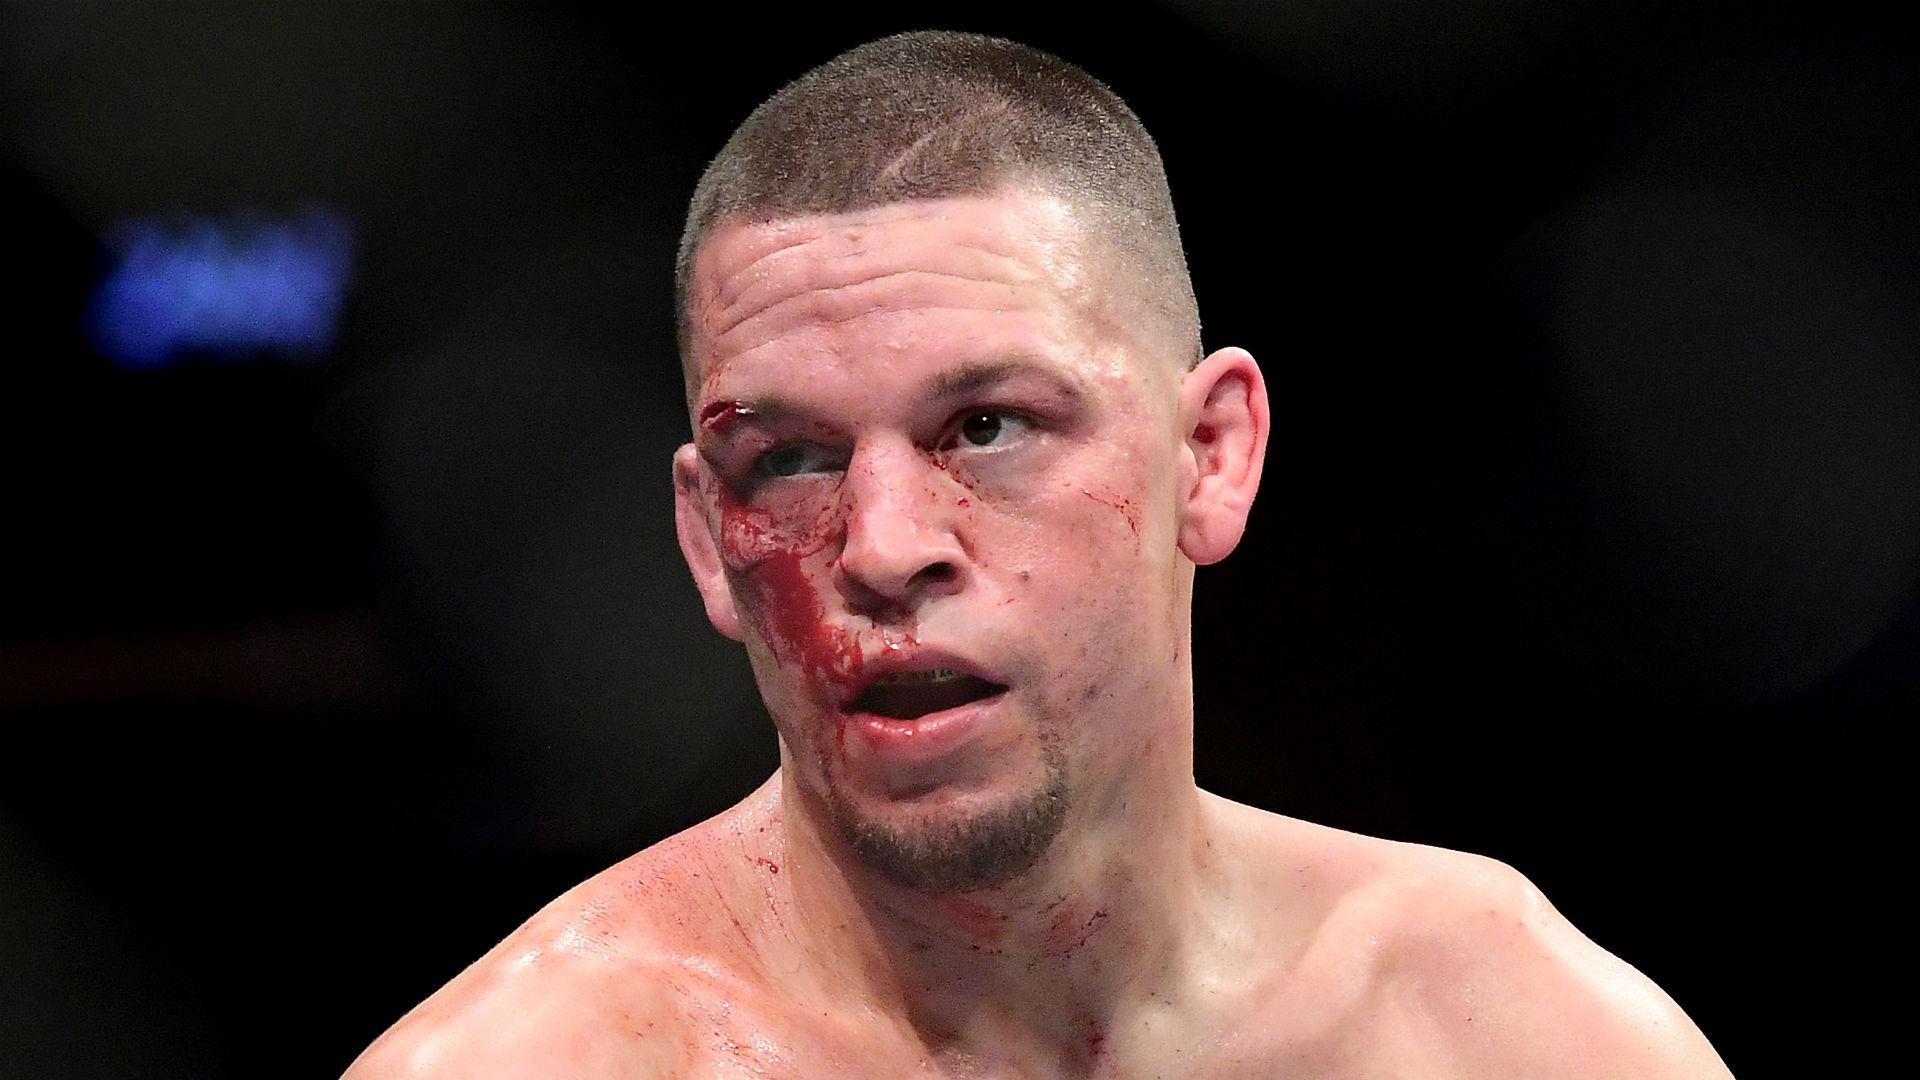 I'll never retire - Diaz denies quitting MMA